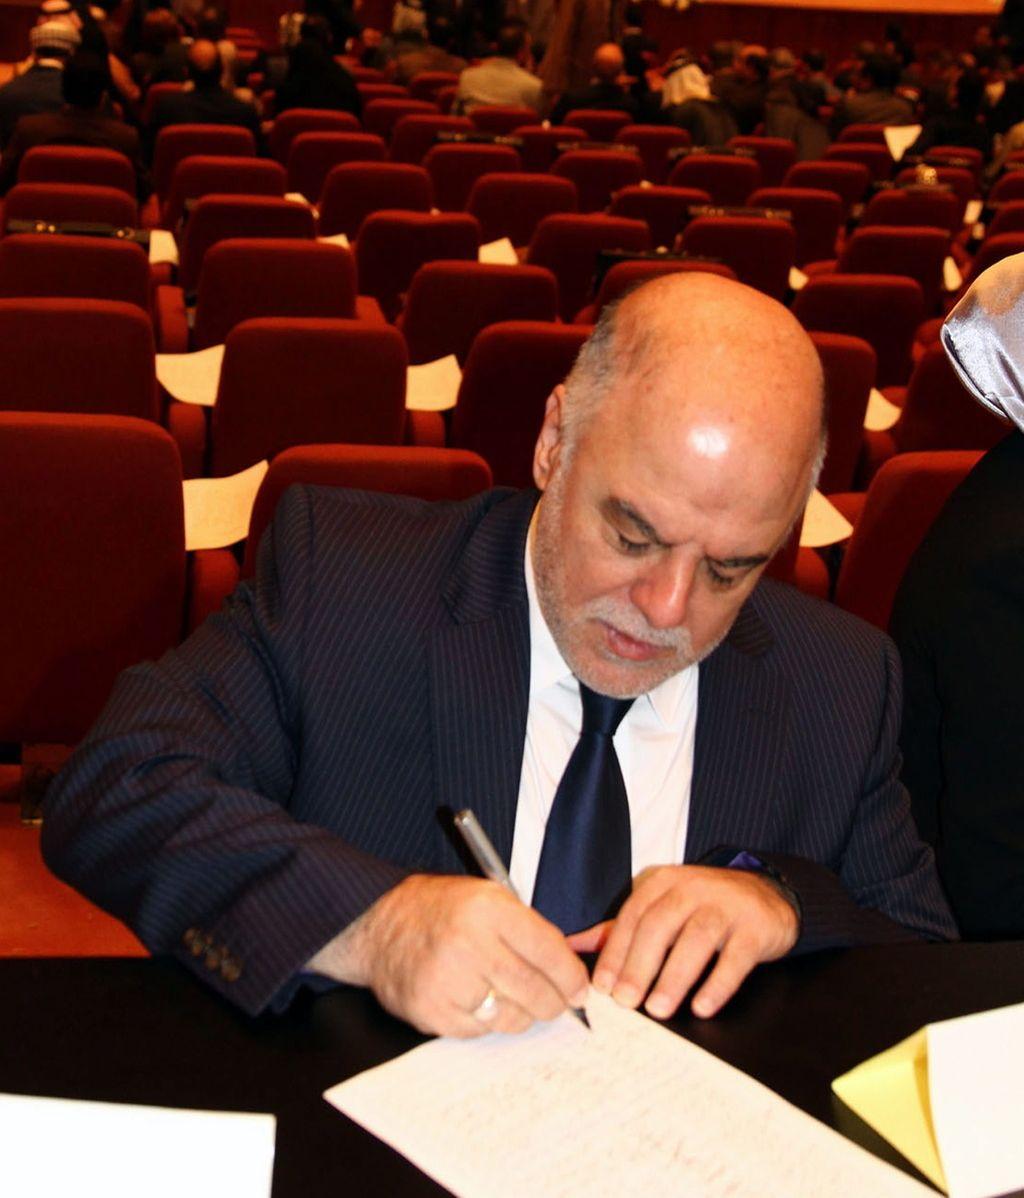 El nuevo primer ministro de Irak, Haider al Abadi.